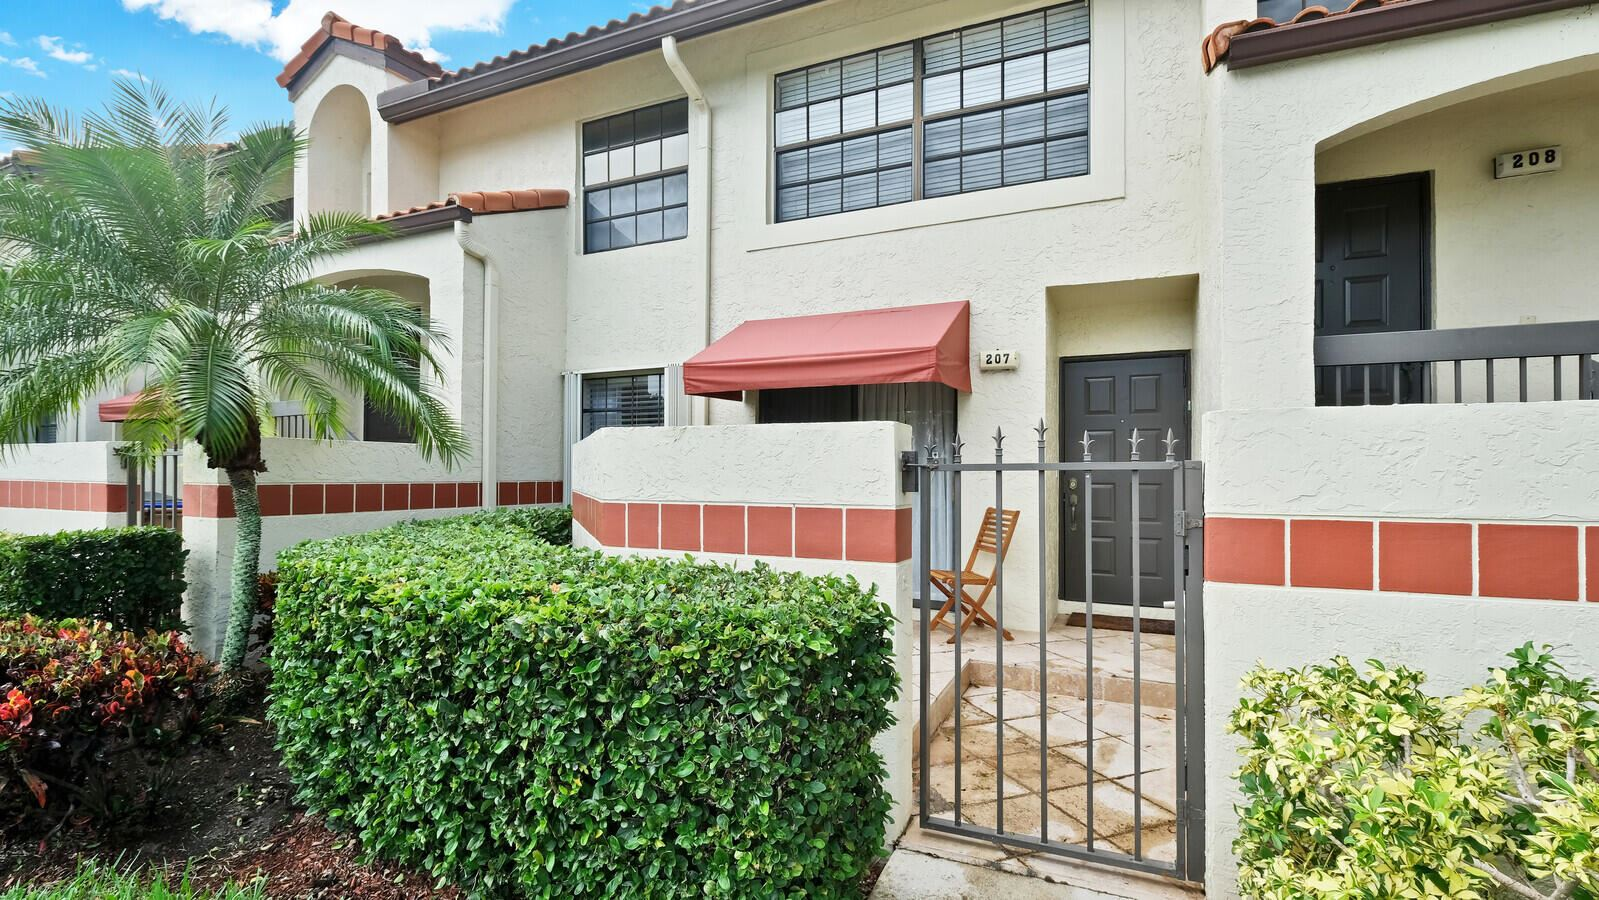 207 Republic Court #207, Deerfield Beach, FL 33442 - MLS#: RX-10742901